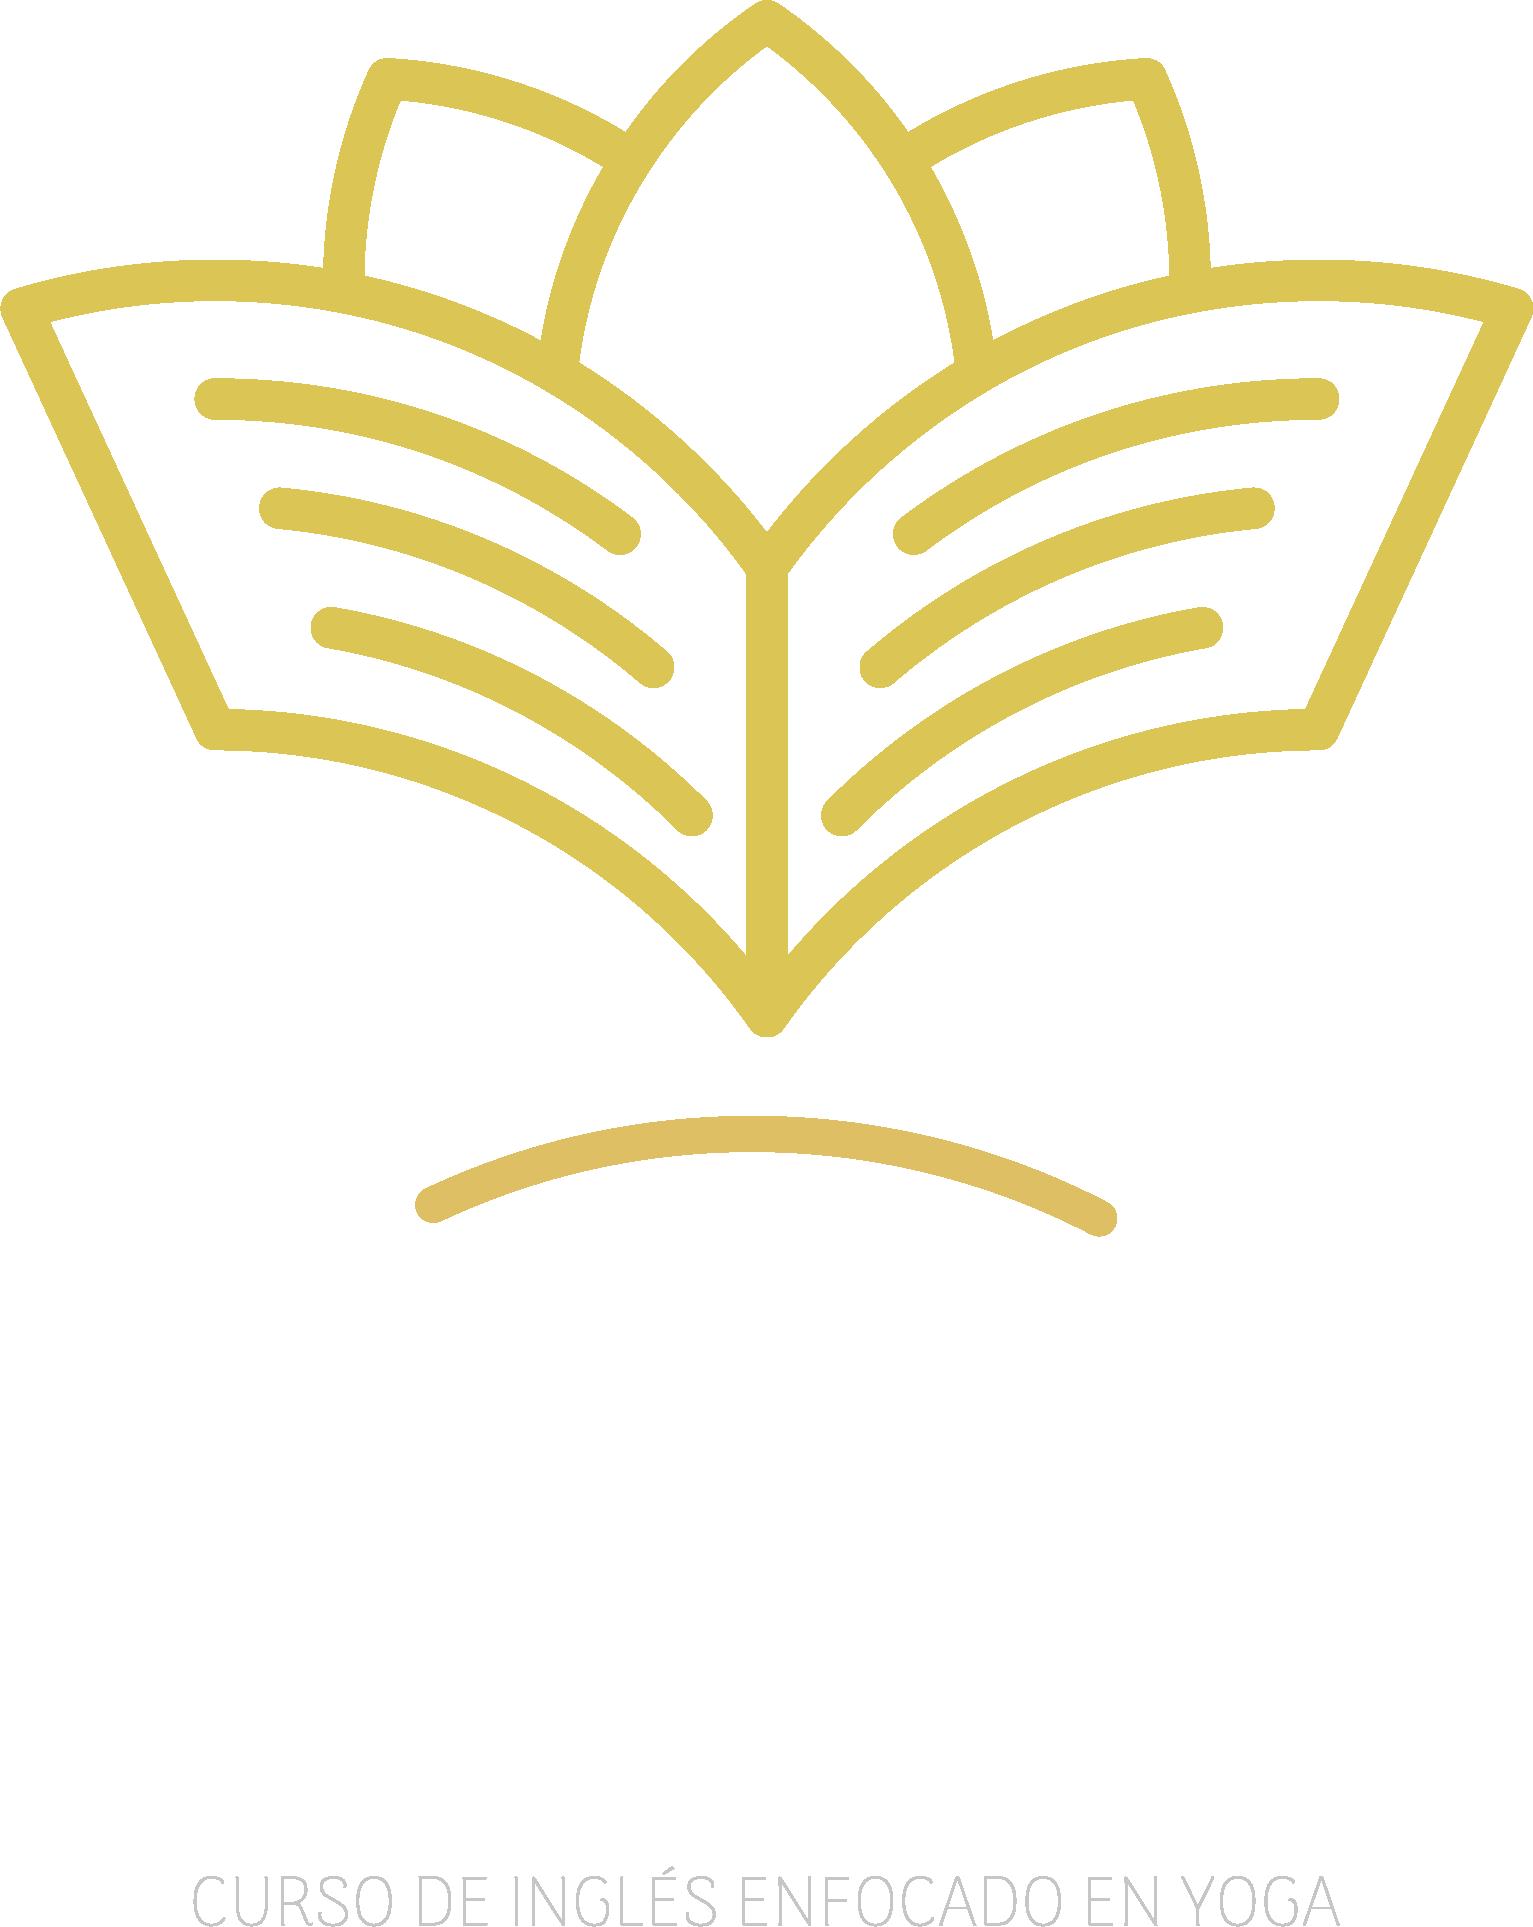 ENGA logo